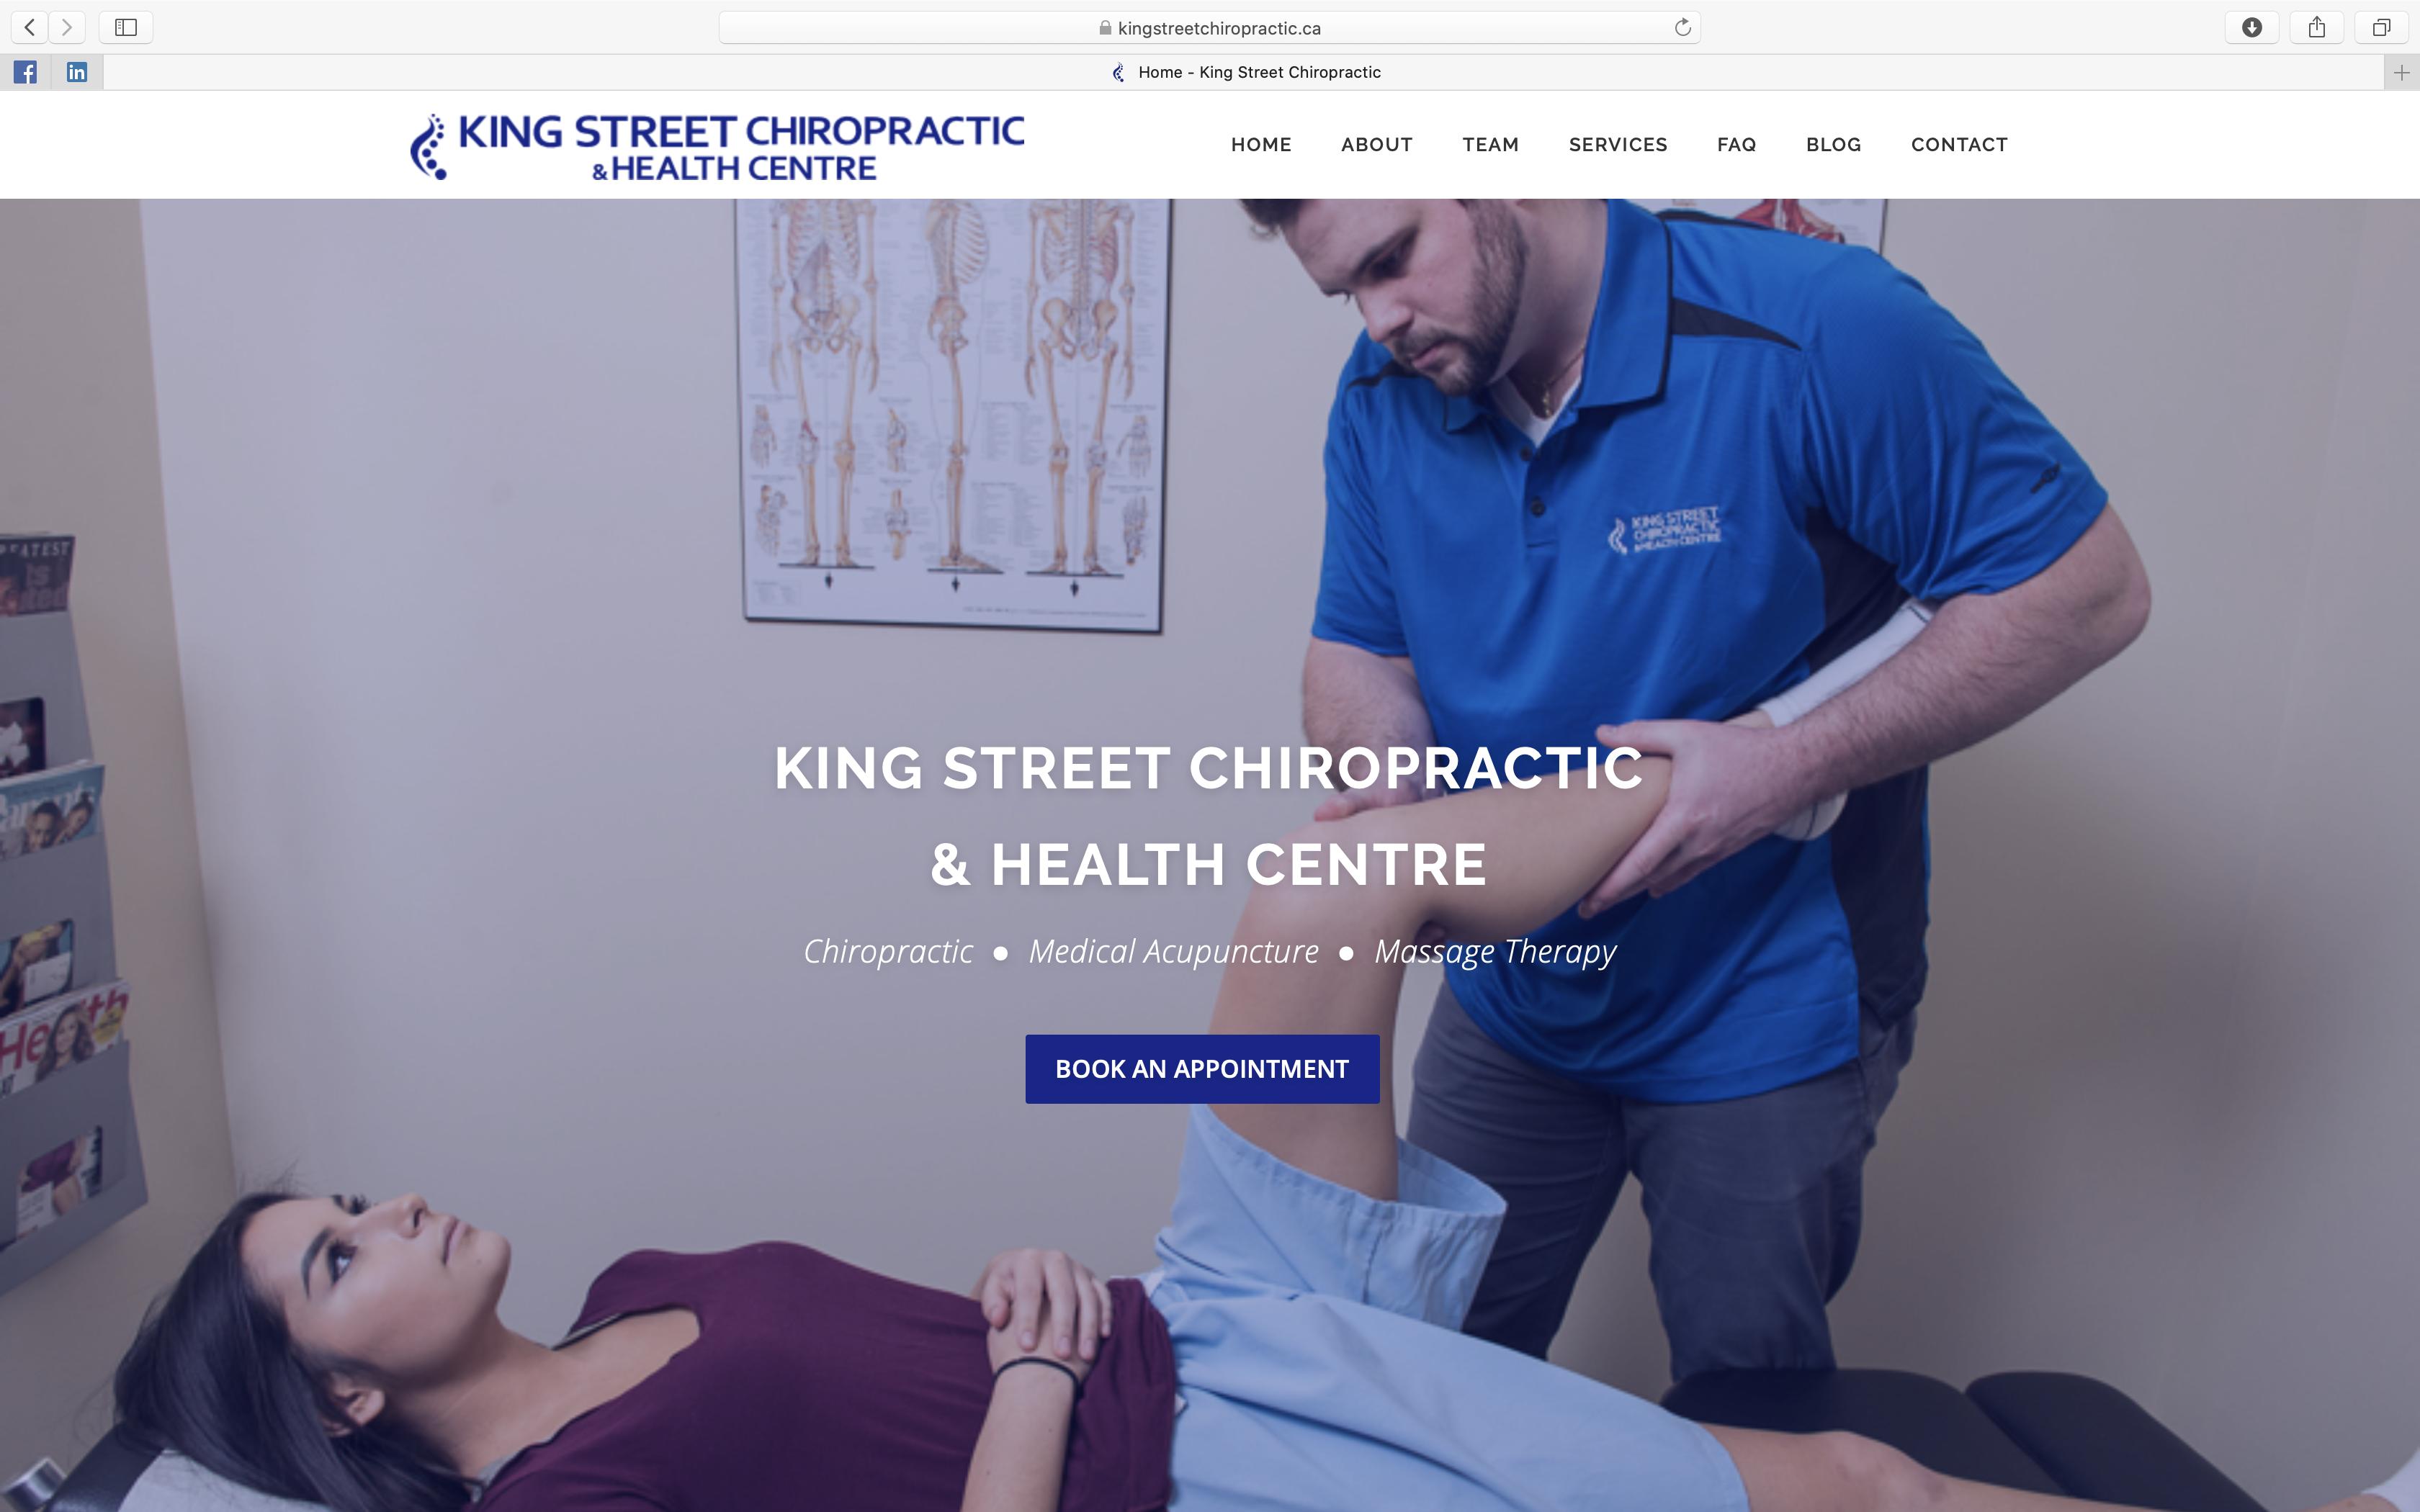 King Street Chiropractic